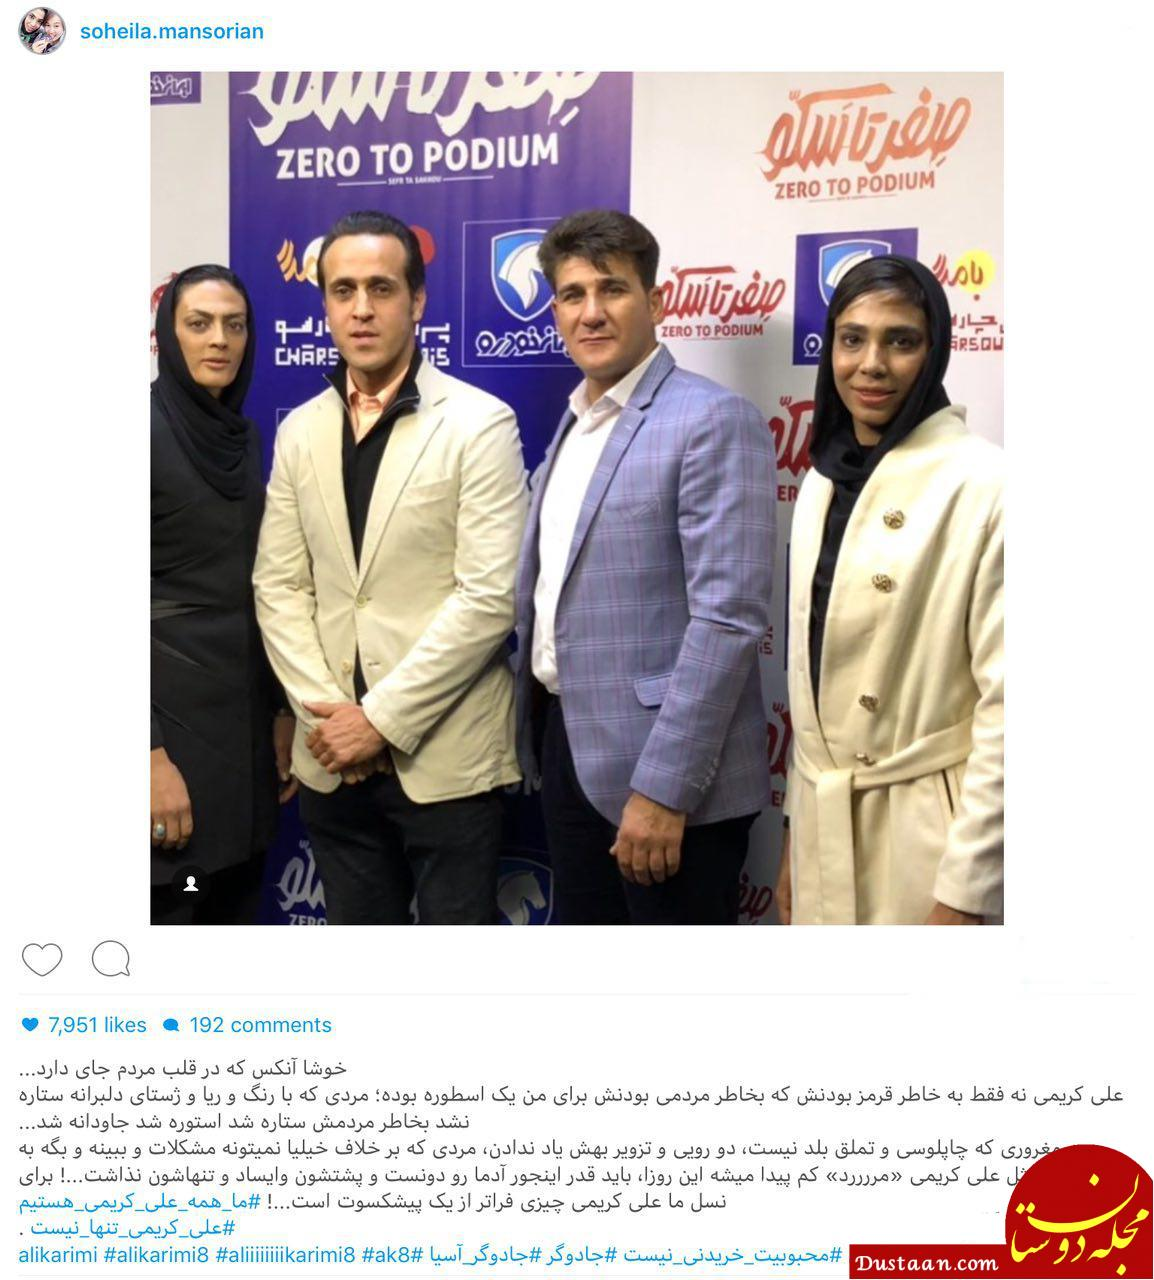 www.dustaan.com تمجید اینستاگرامى سهیلا منصوریان از على کریمى +عکس